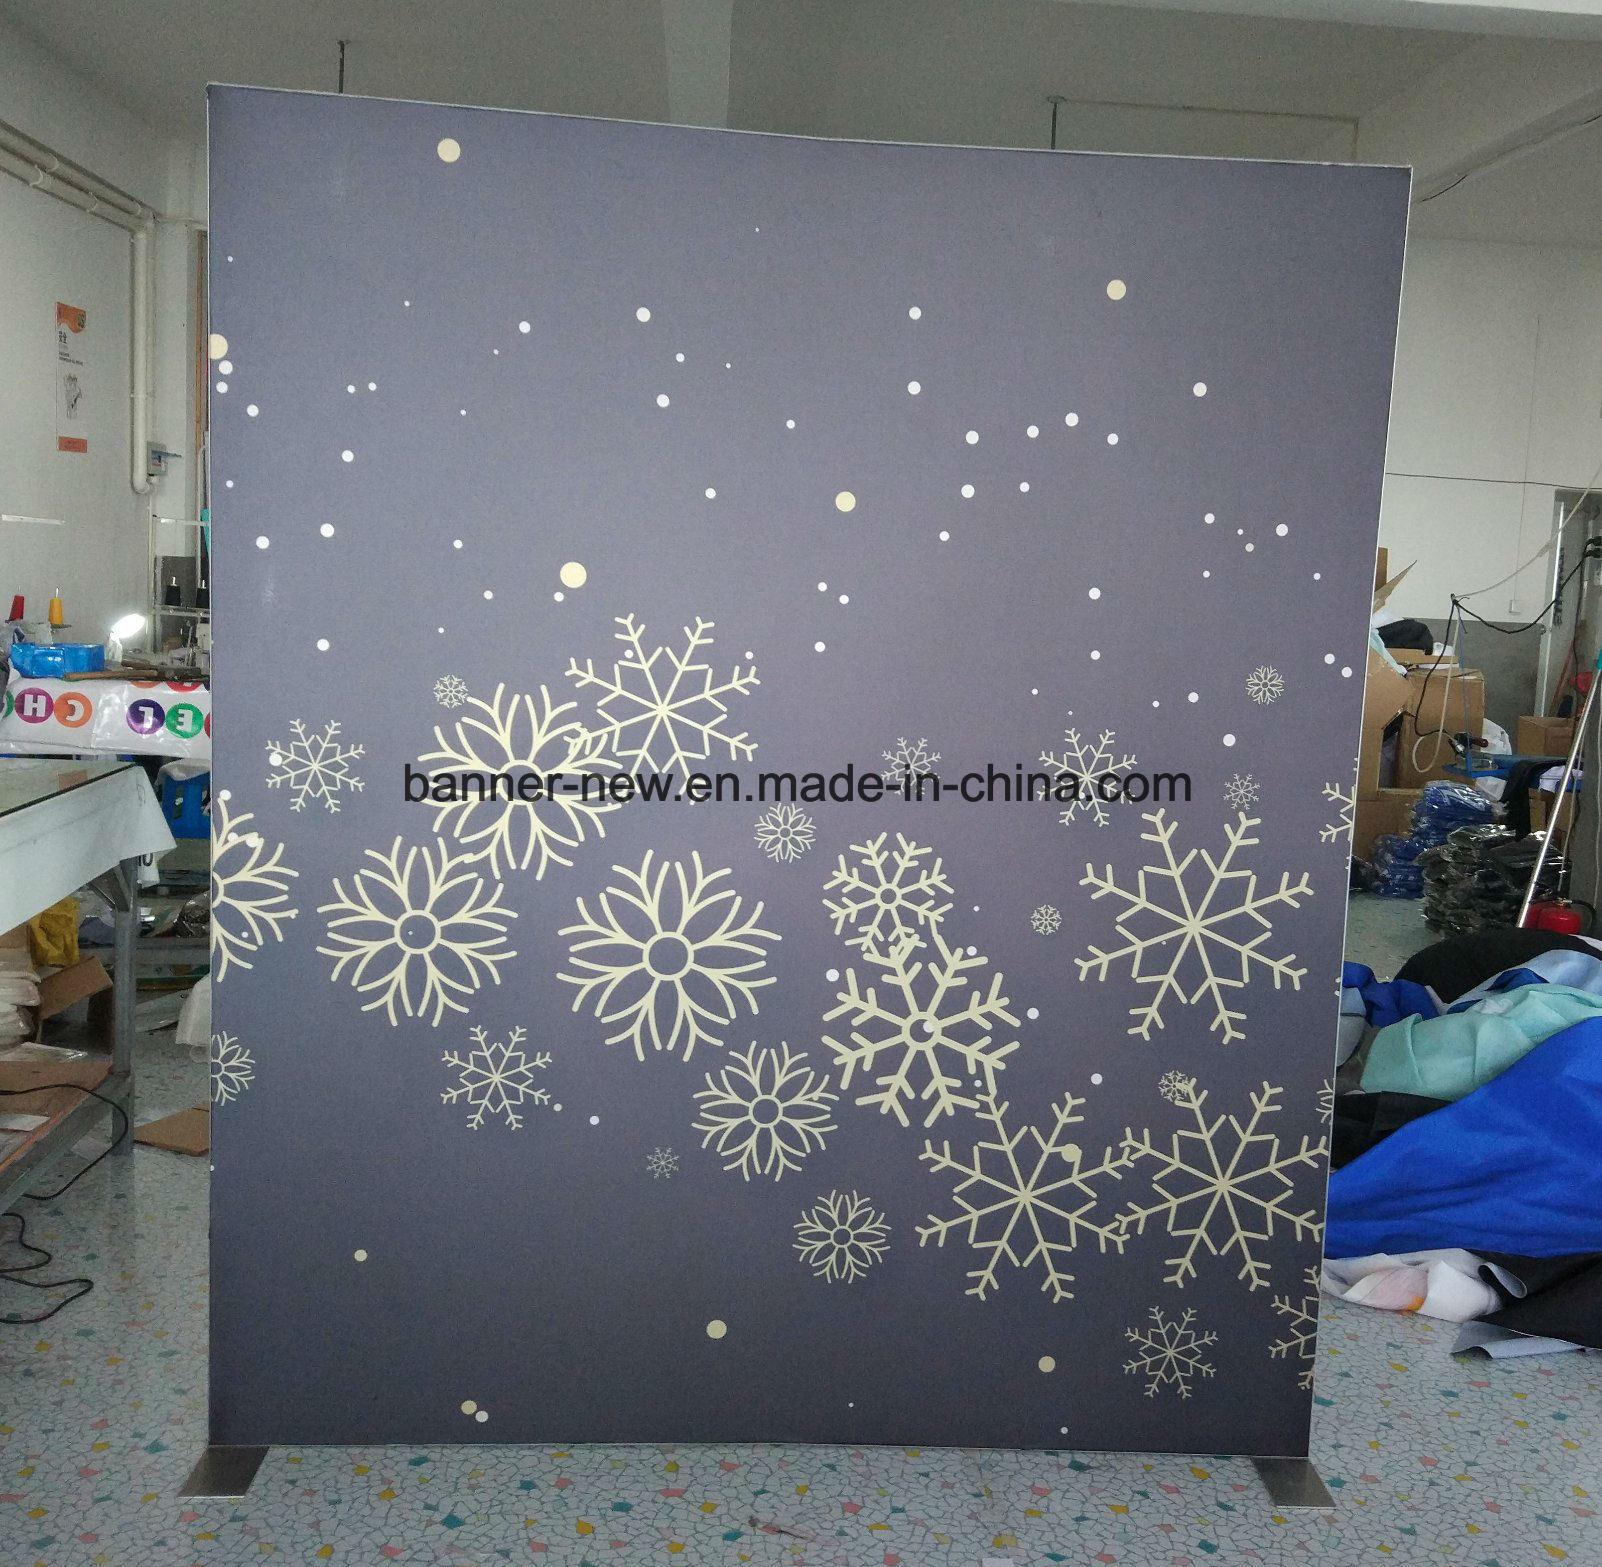 10FT Width Mimaki Printer Aluminum Frame Fabric Display Banner